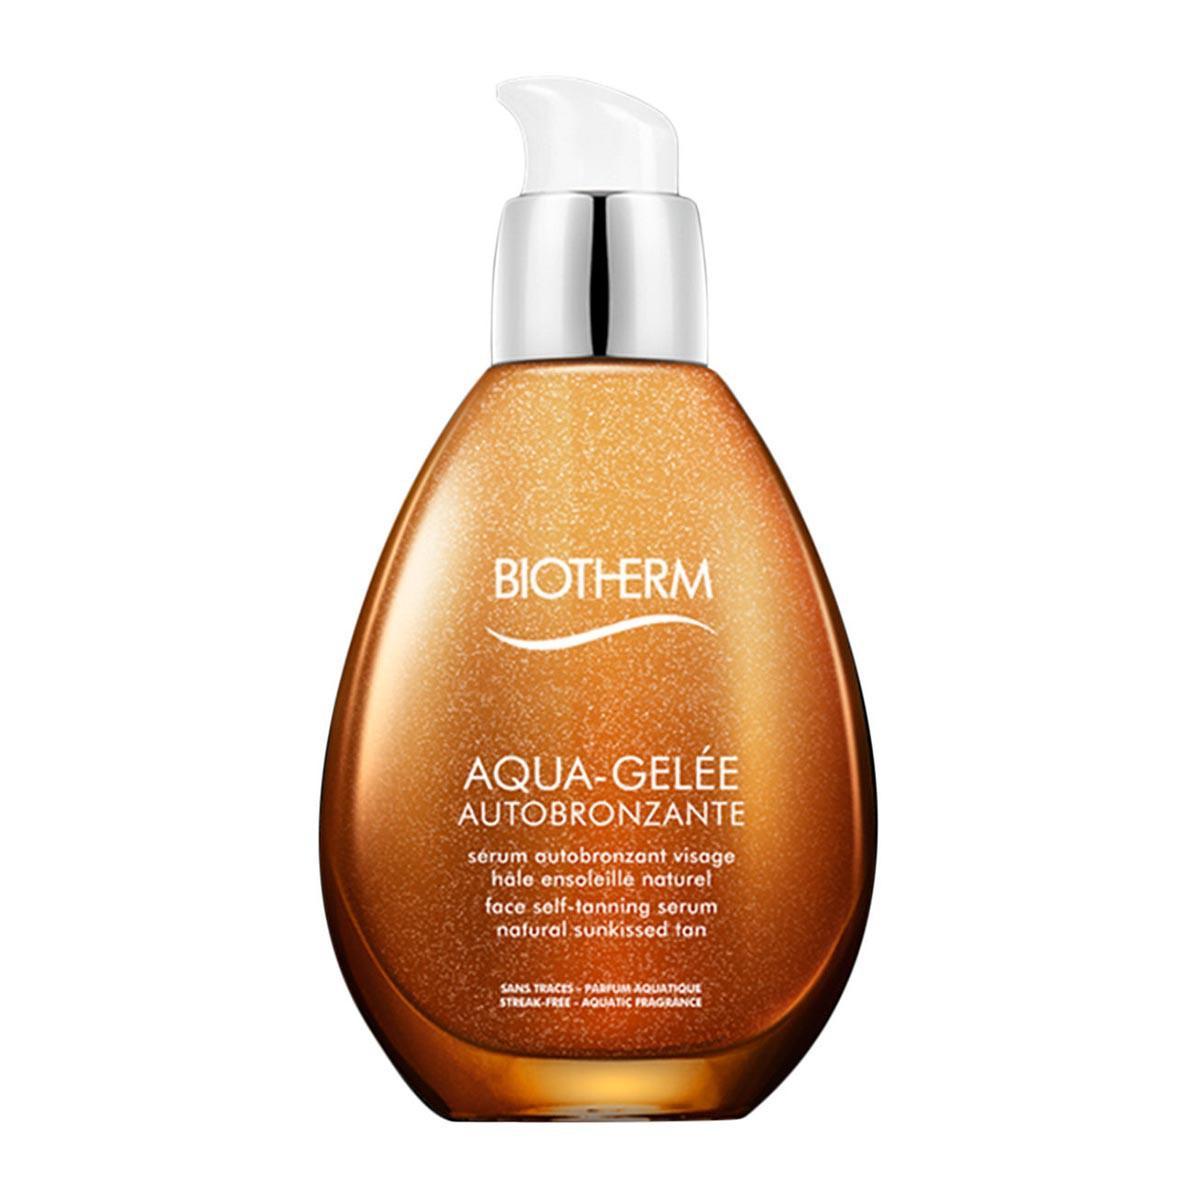 Biotherm-fragrances Aqua Gelee Autobronzant Serum Visage 50ml